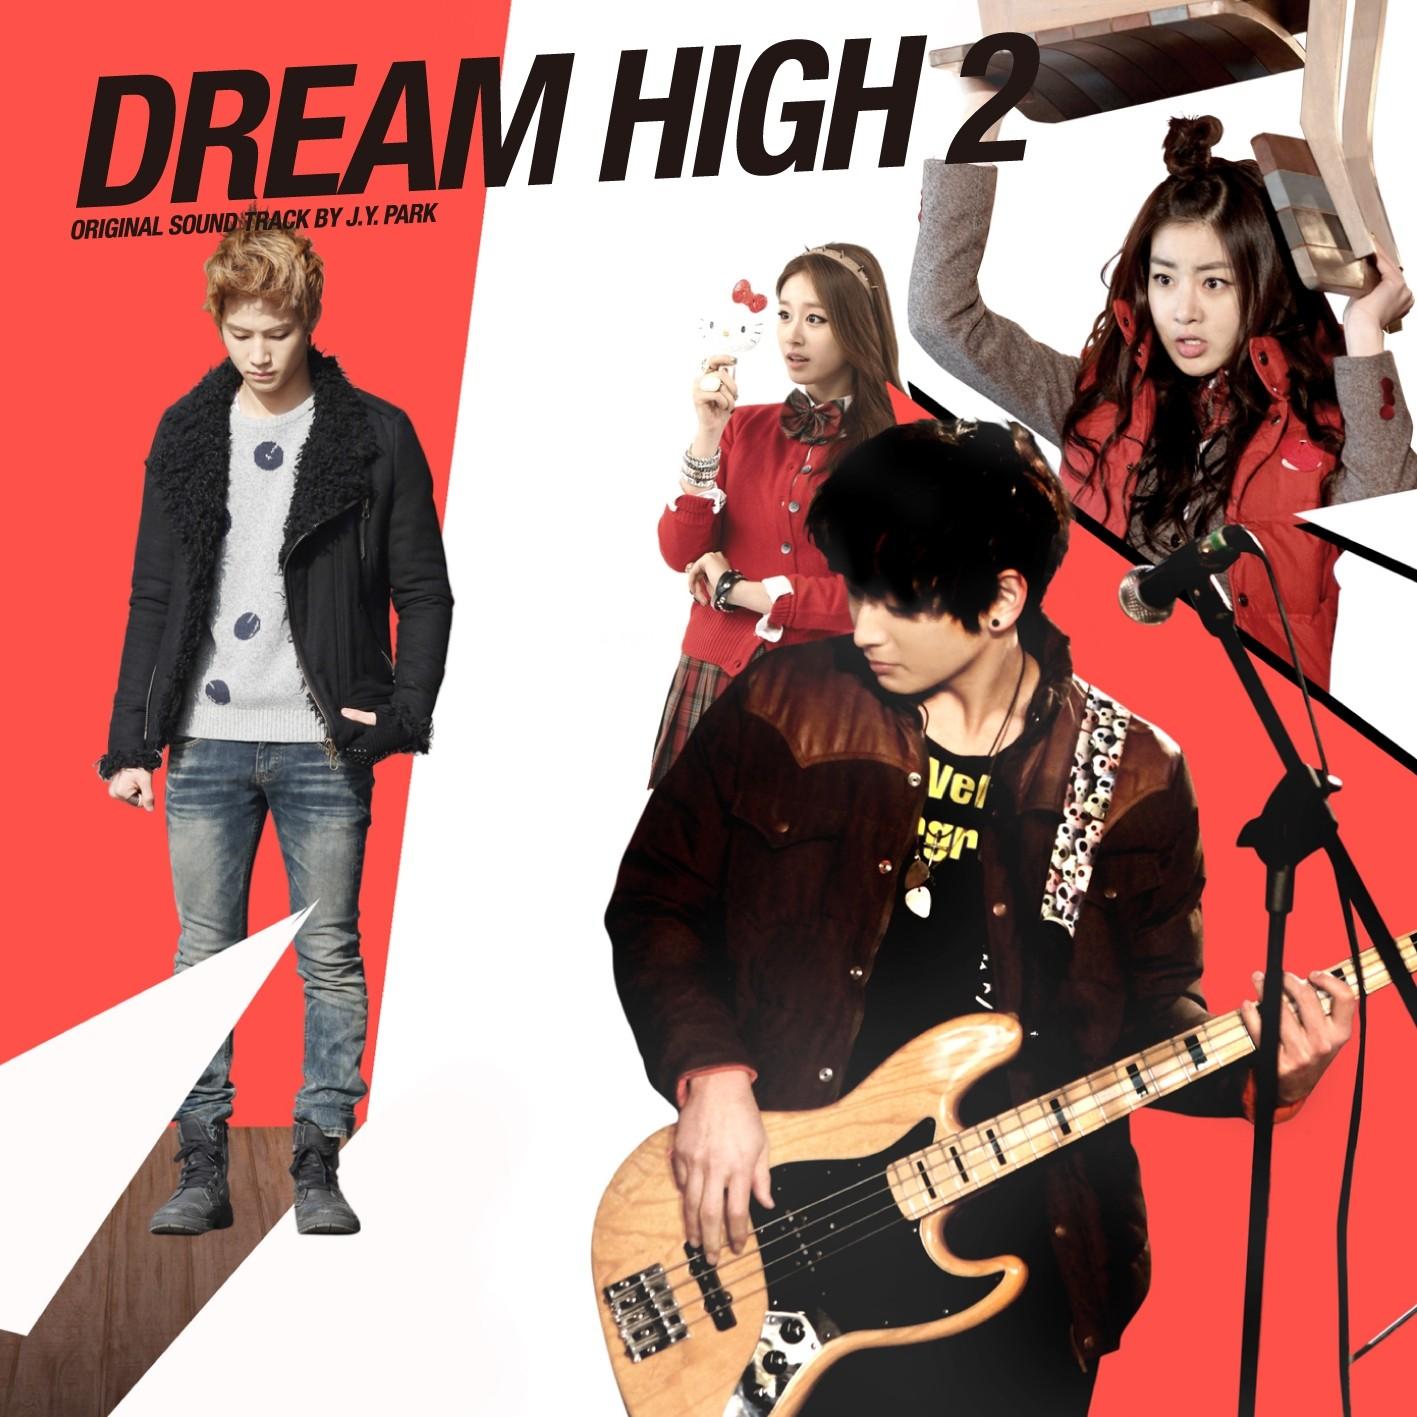 Serie Musical >> Dream High 2(OST) - Página 3 99035z